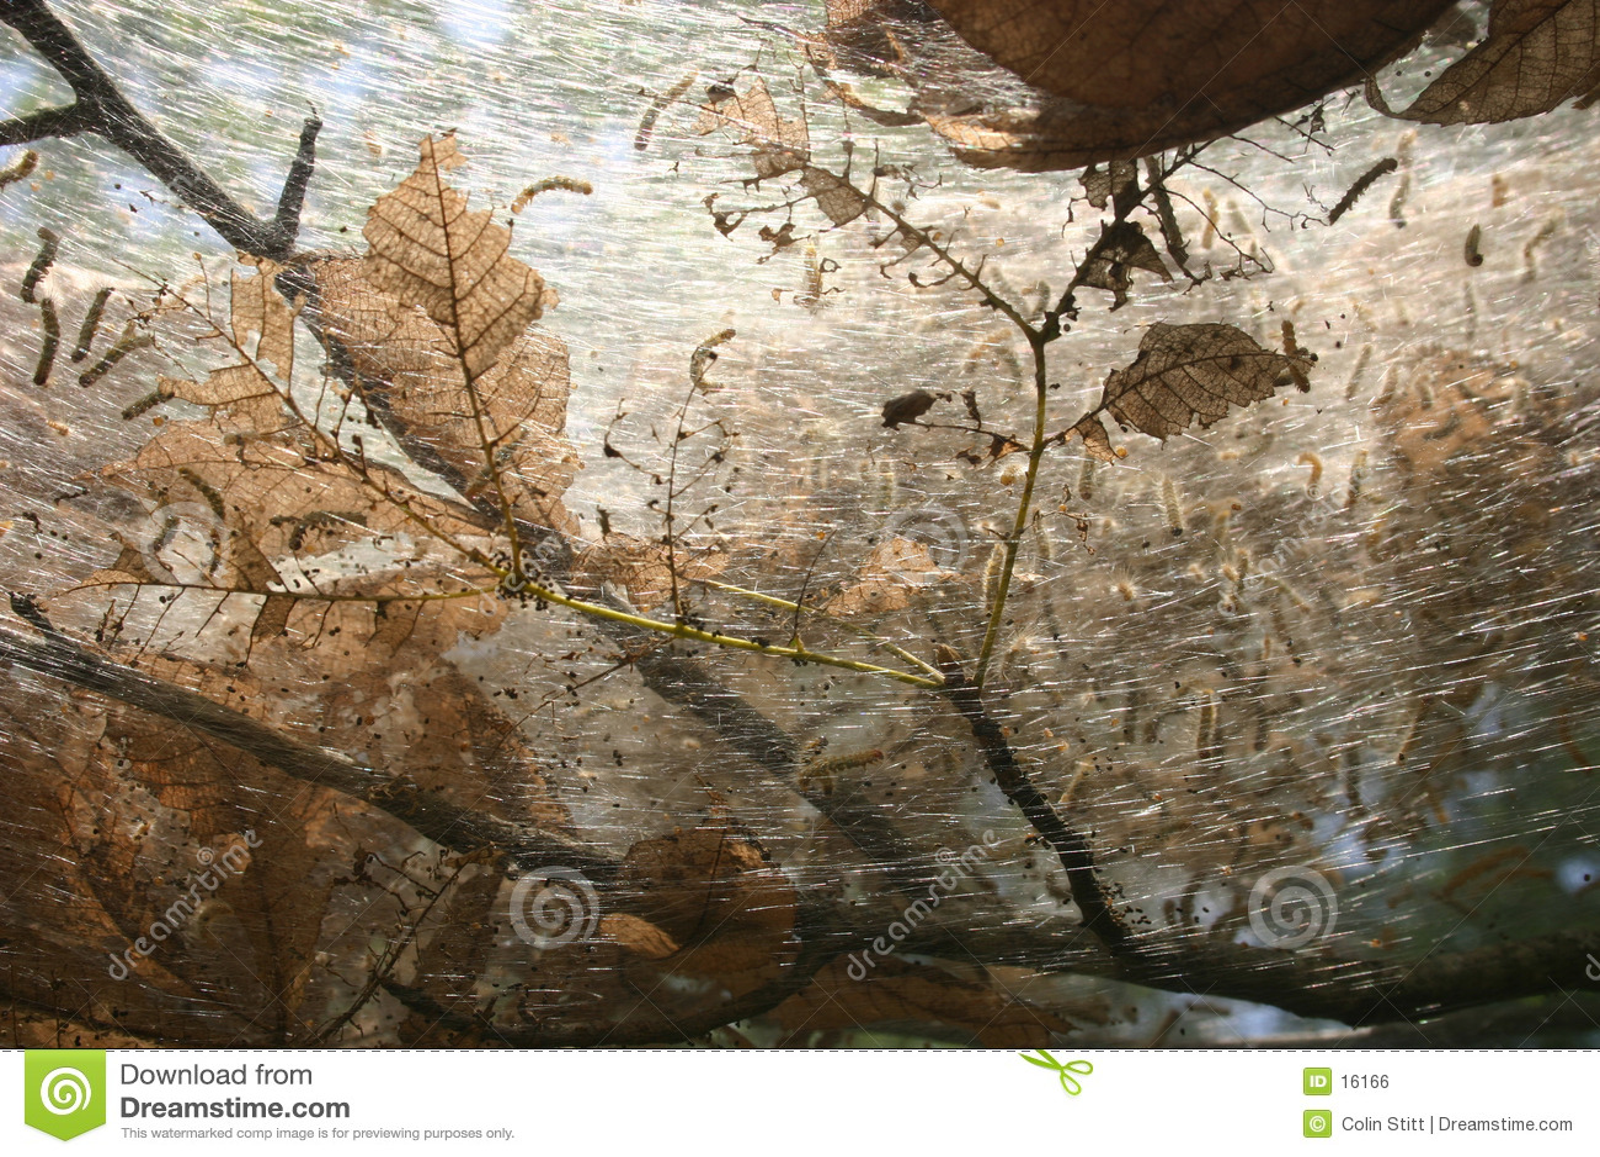 Nest der Endlosschraube